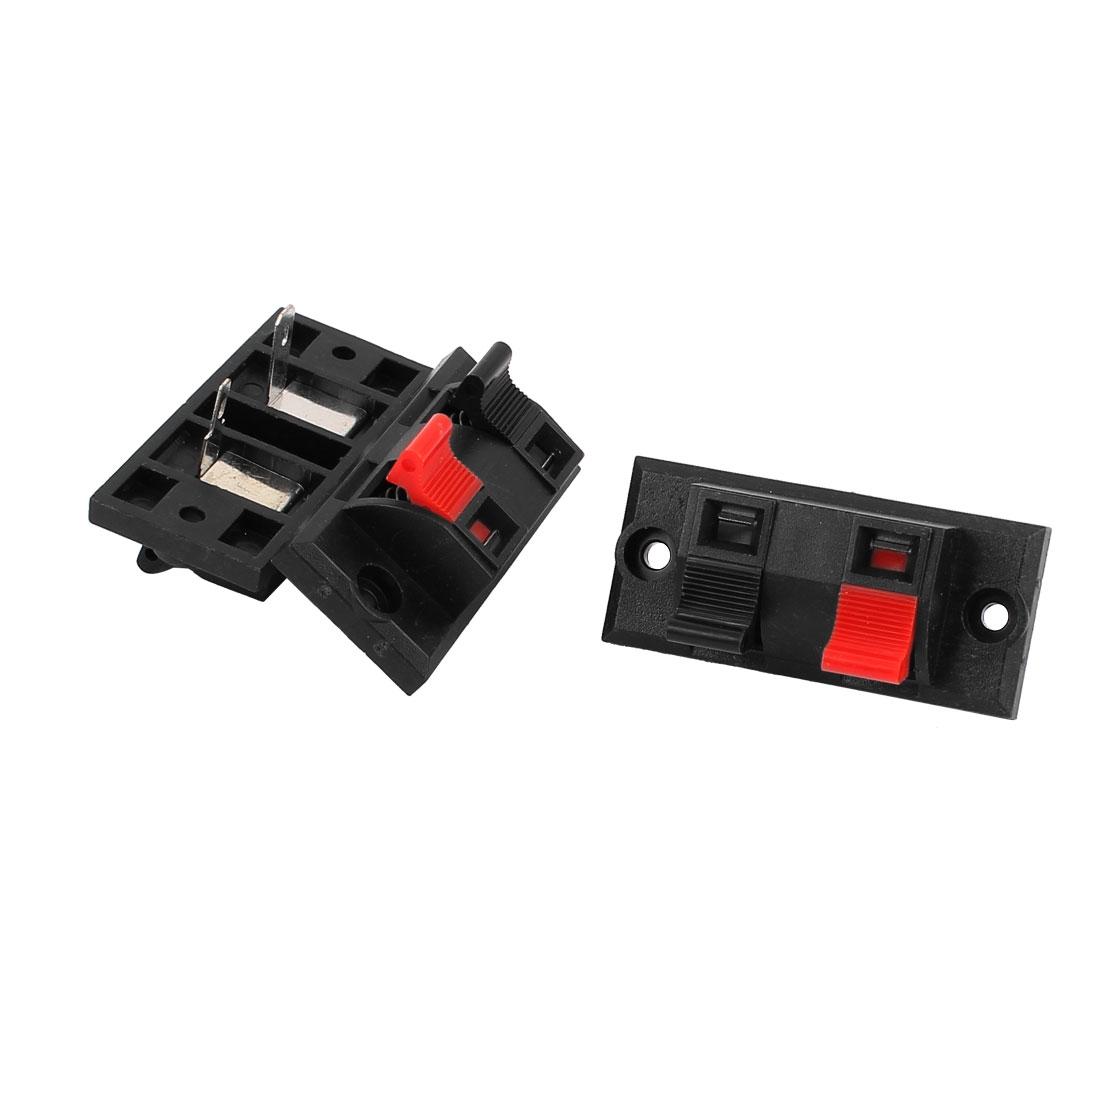 3Pcs 2 Way Jack Socket Spring Push Release Connector Speaker Terminal Block